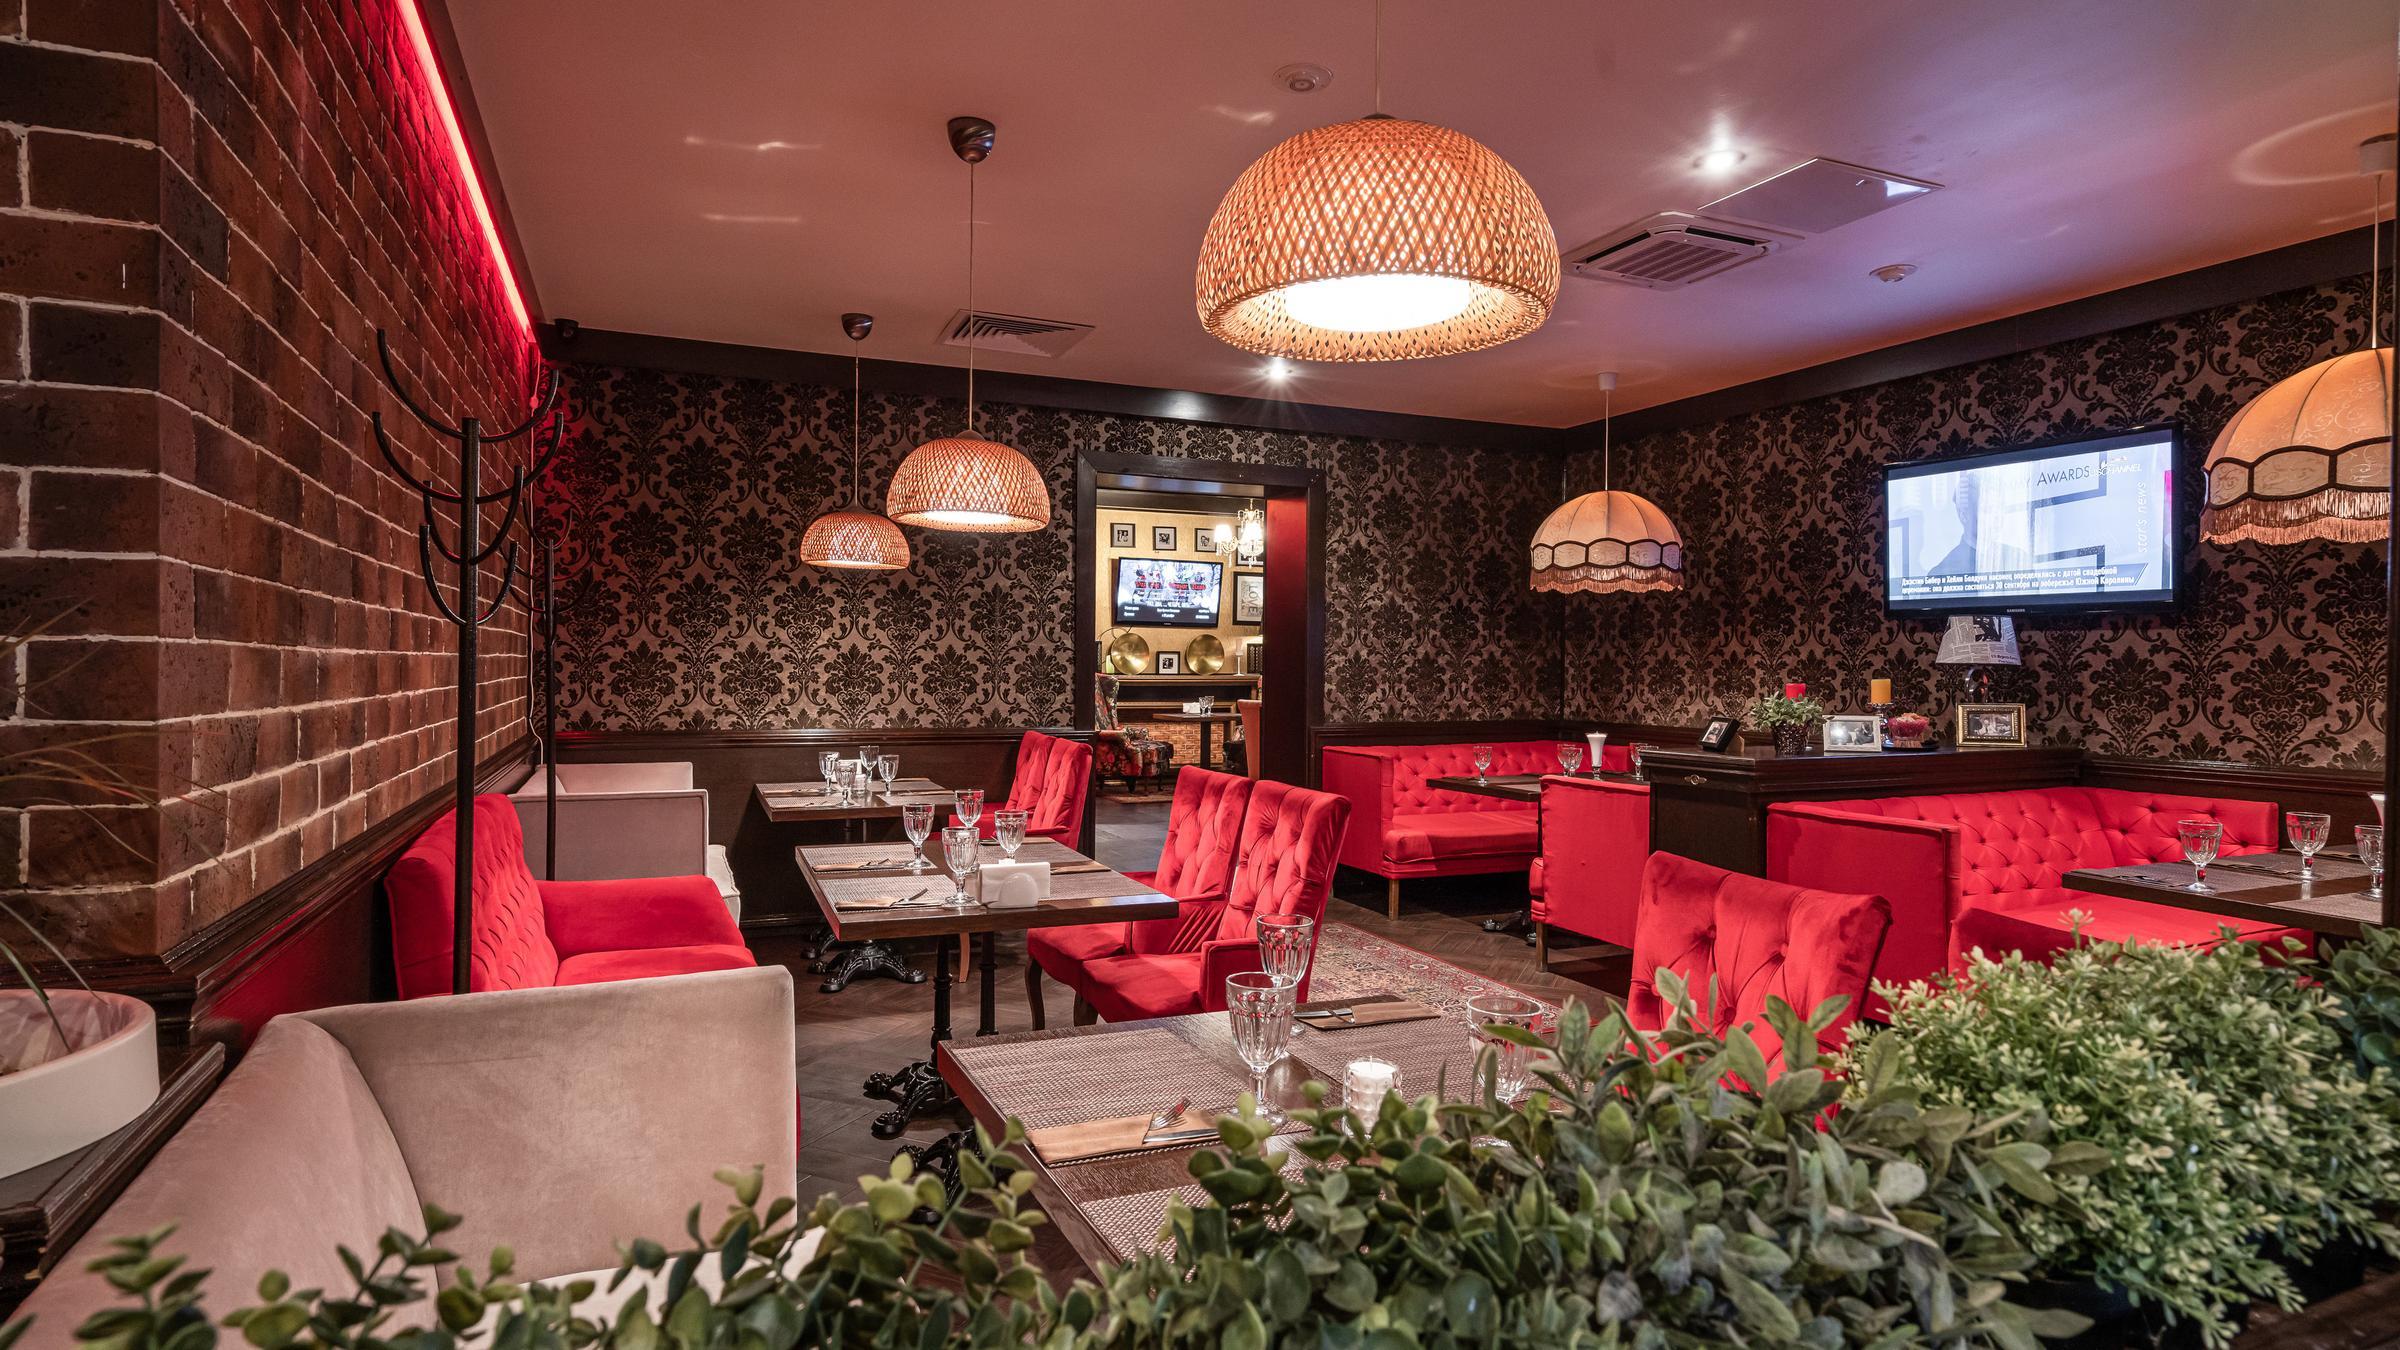 фотография Ресторана Сим Сити Home на Братиславской улице